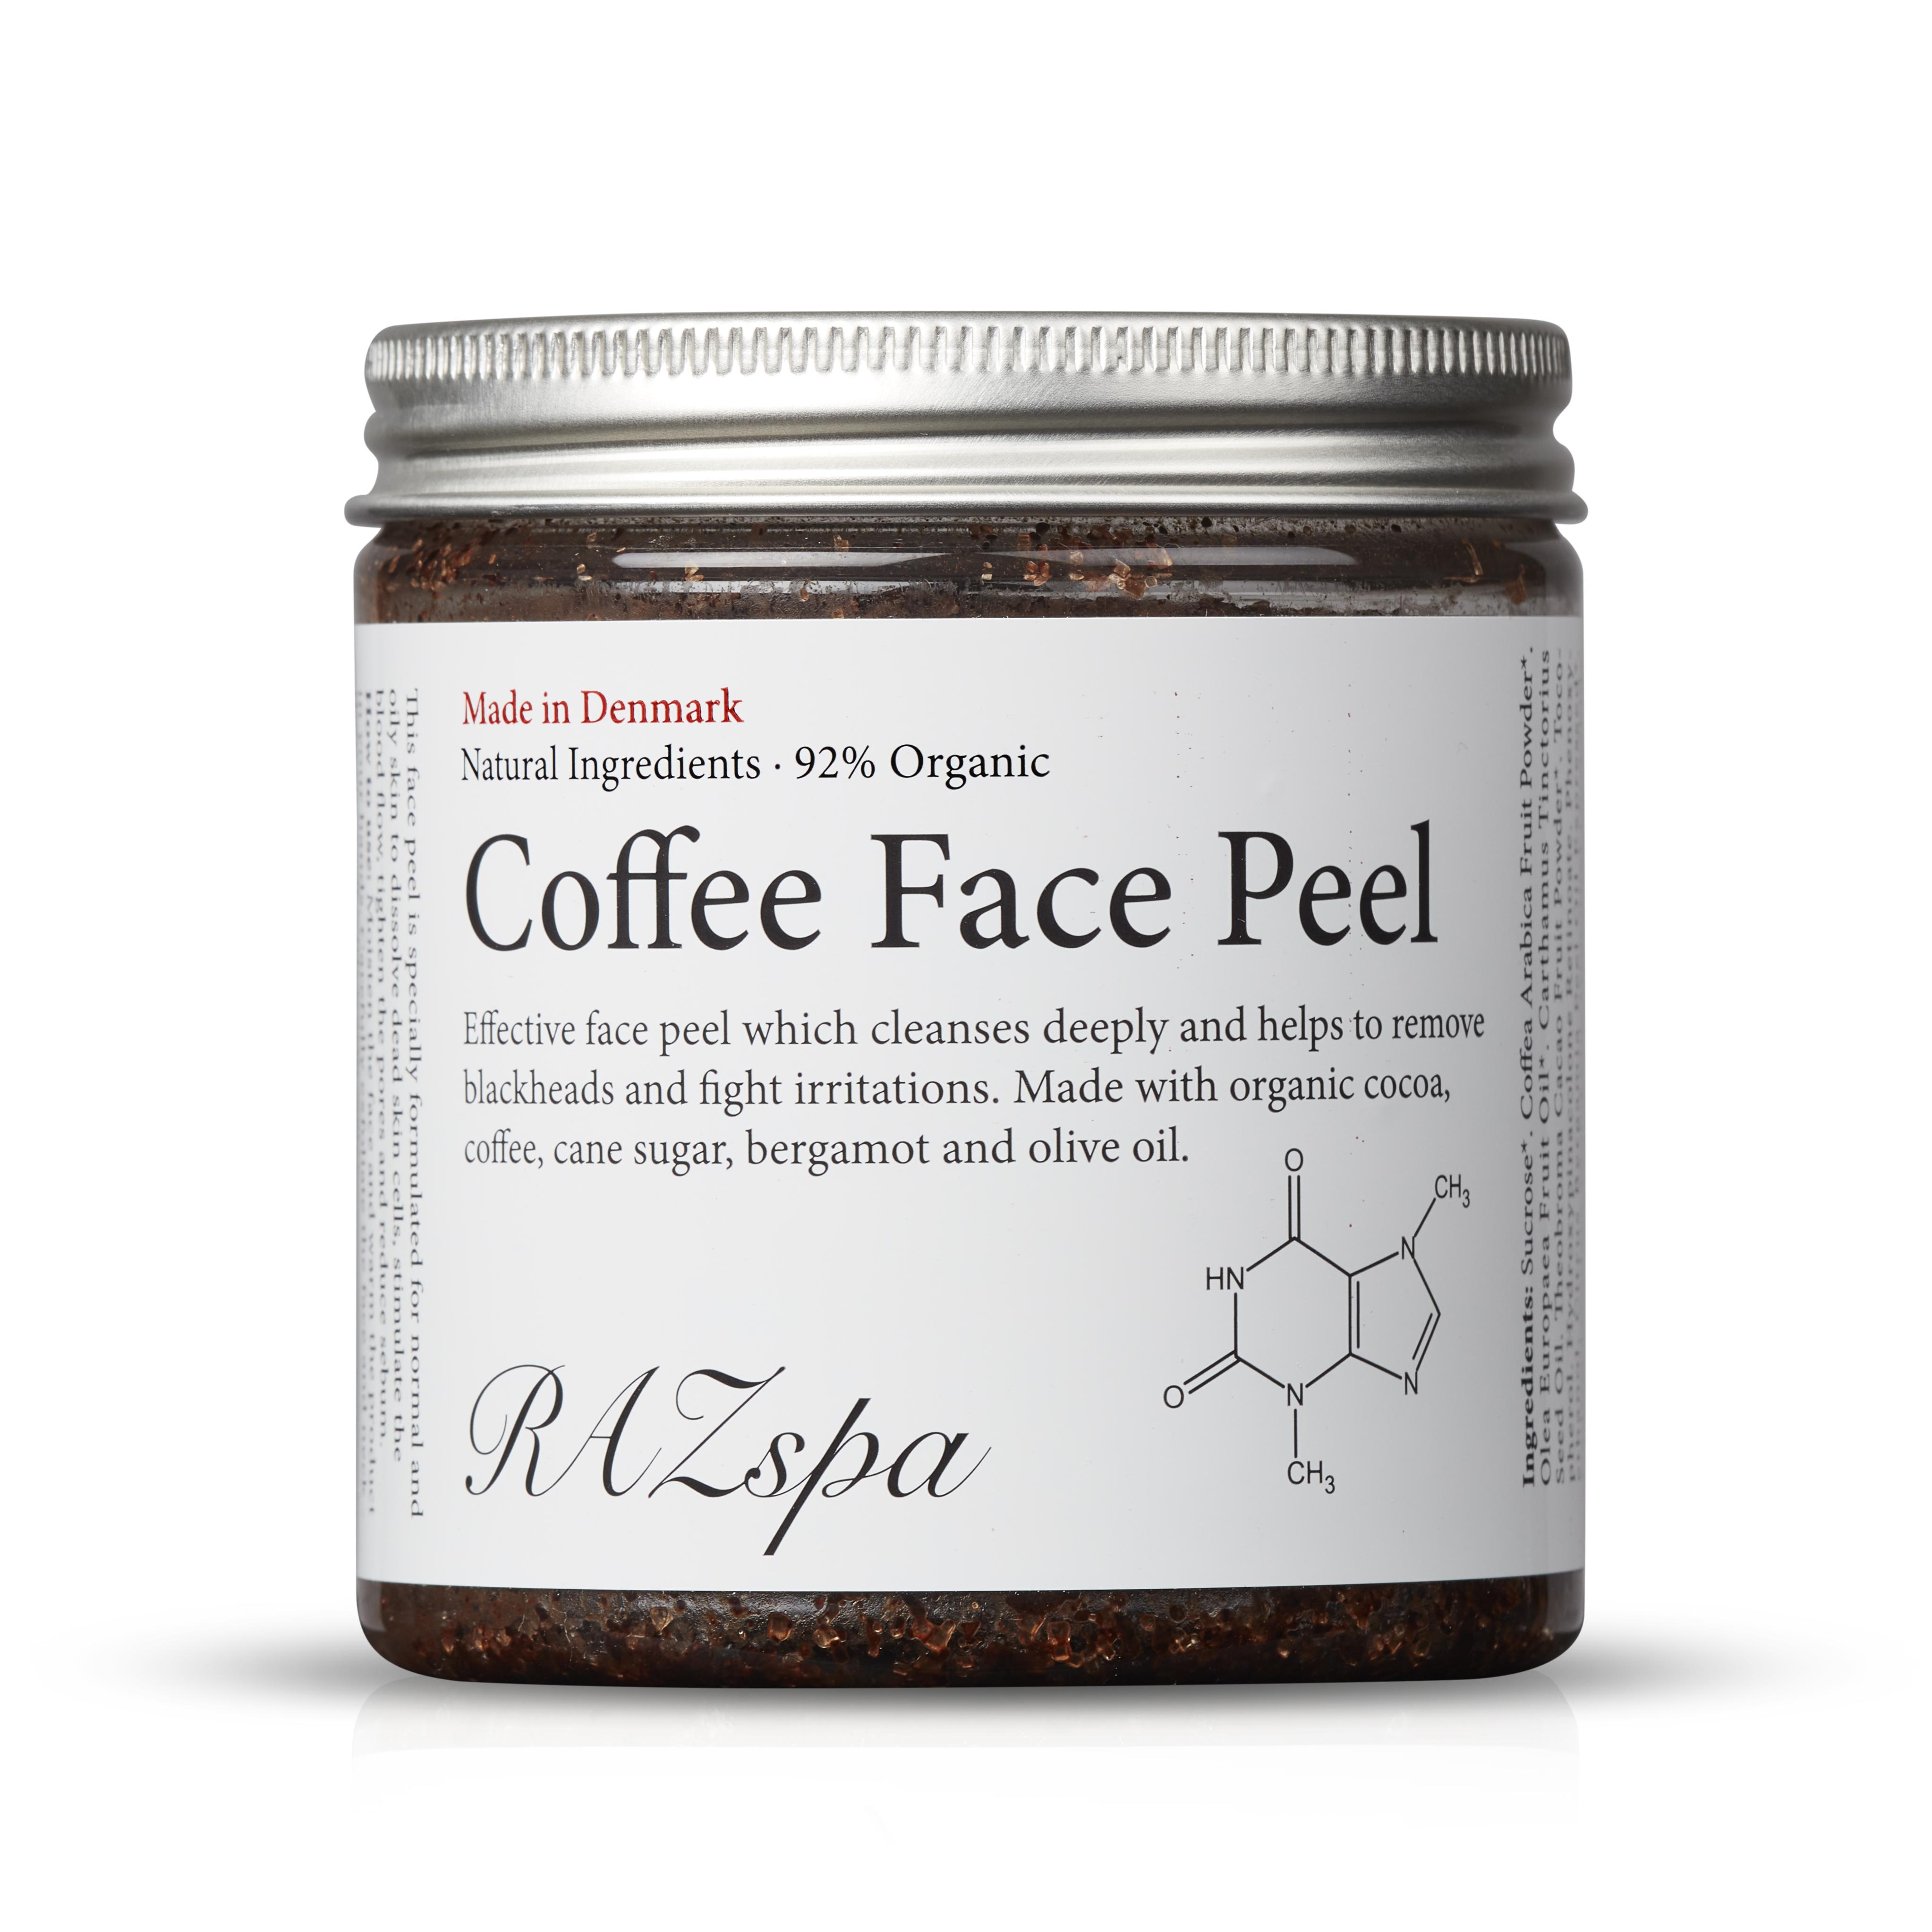 RAZspa Coffee Face Peel, 200 g